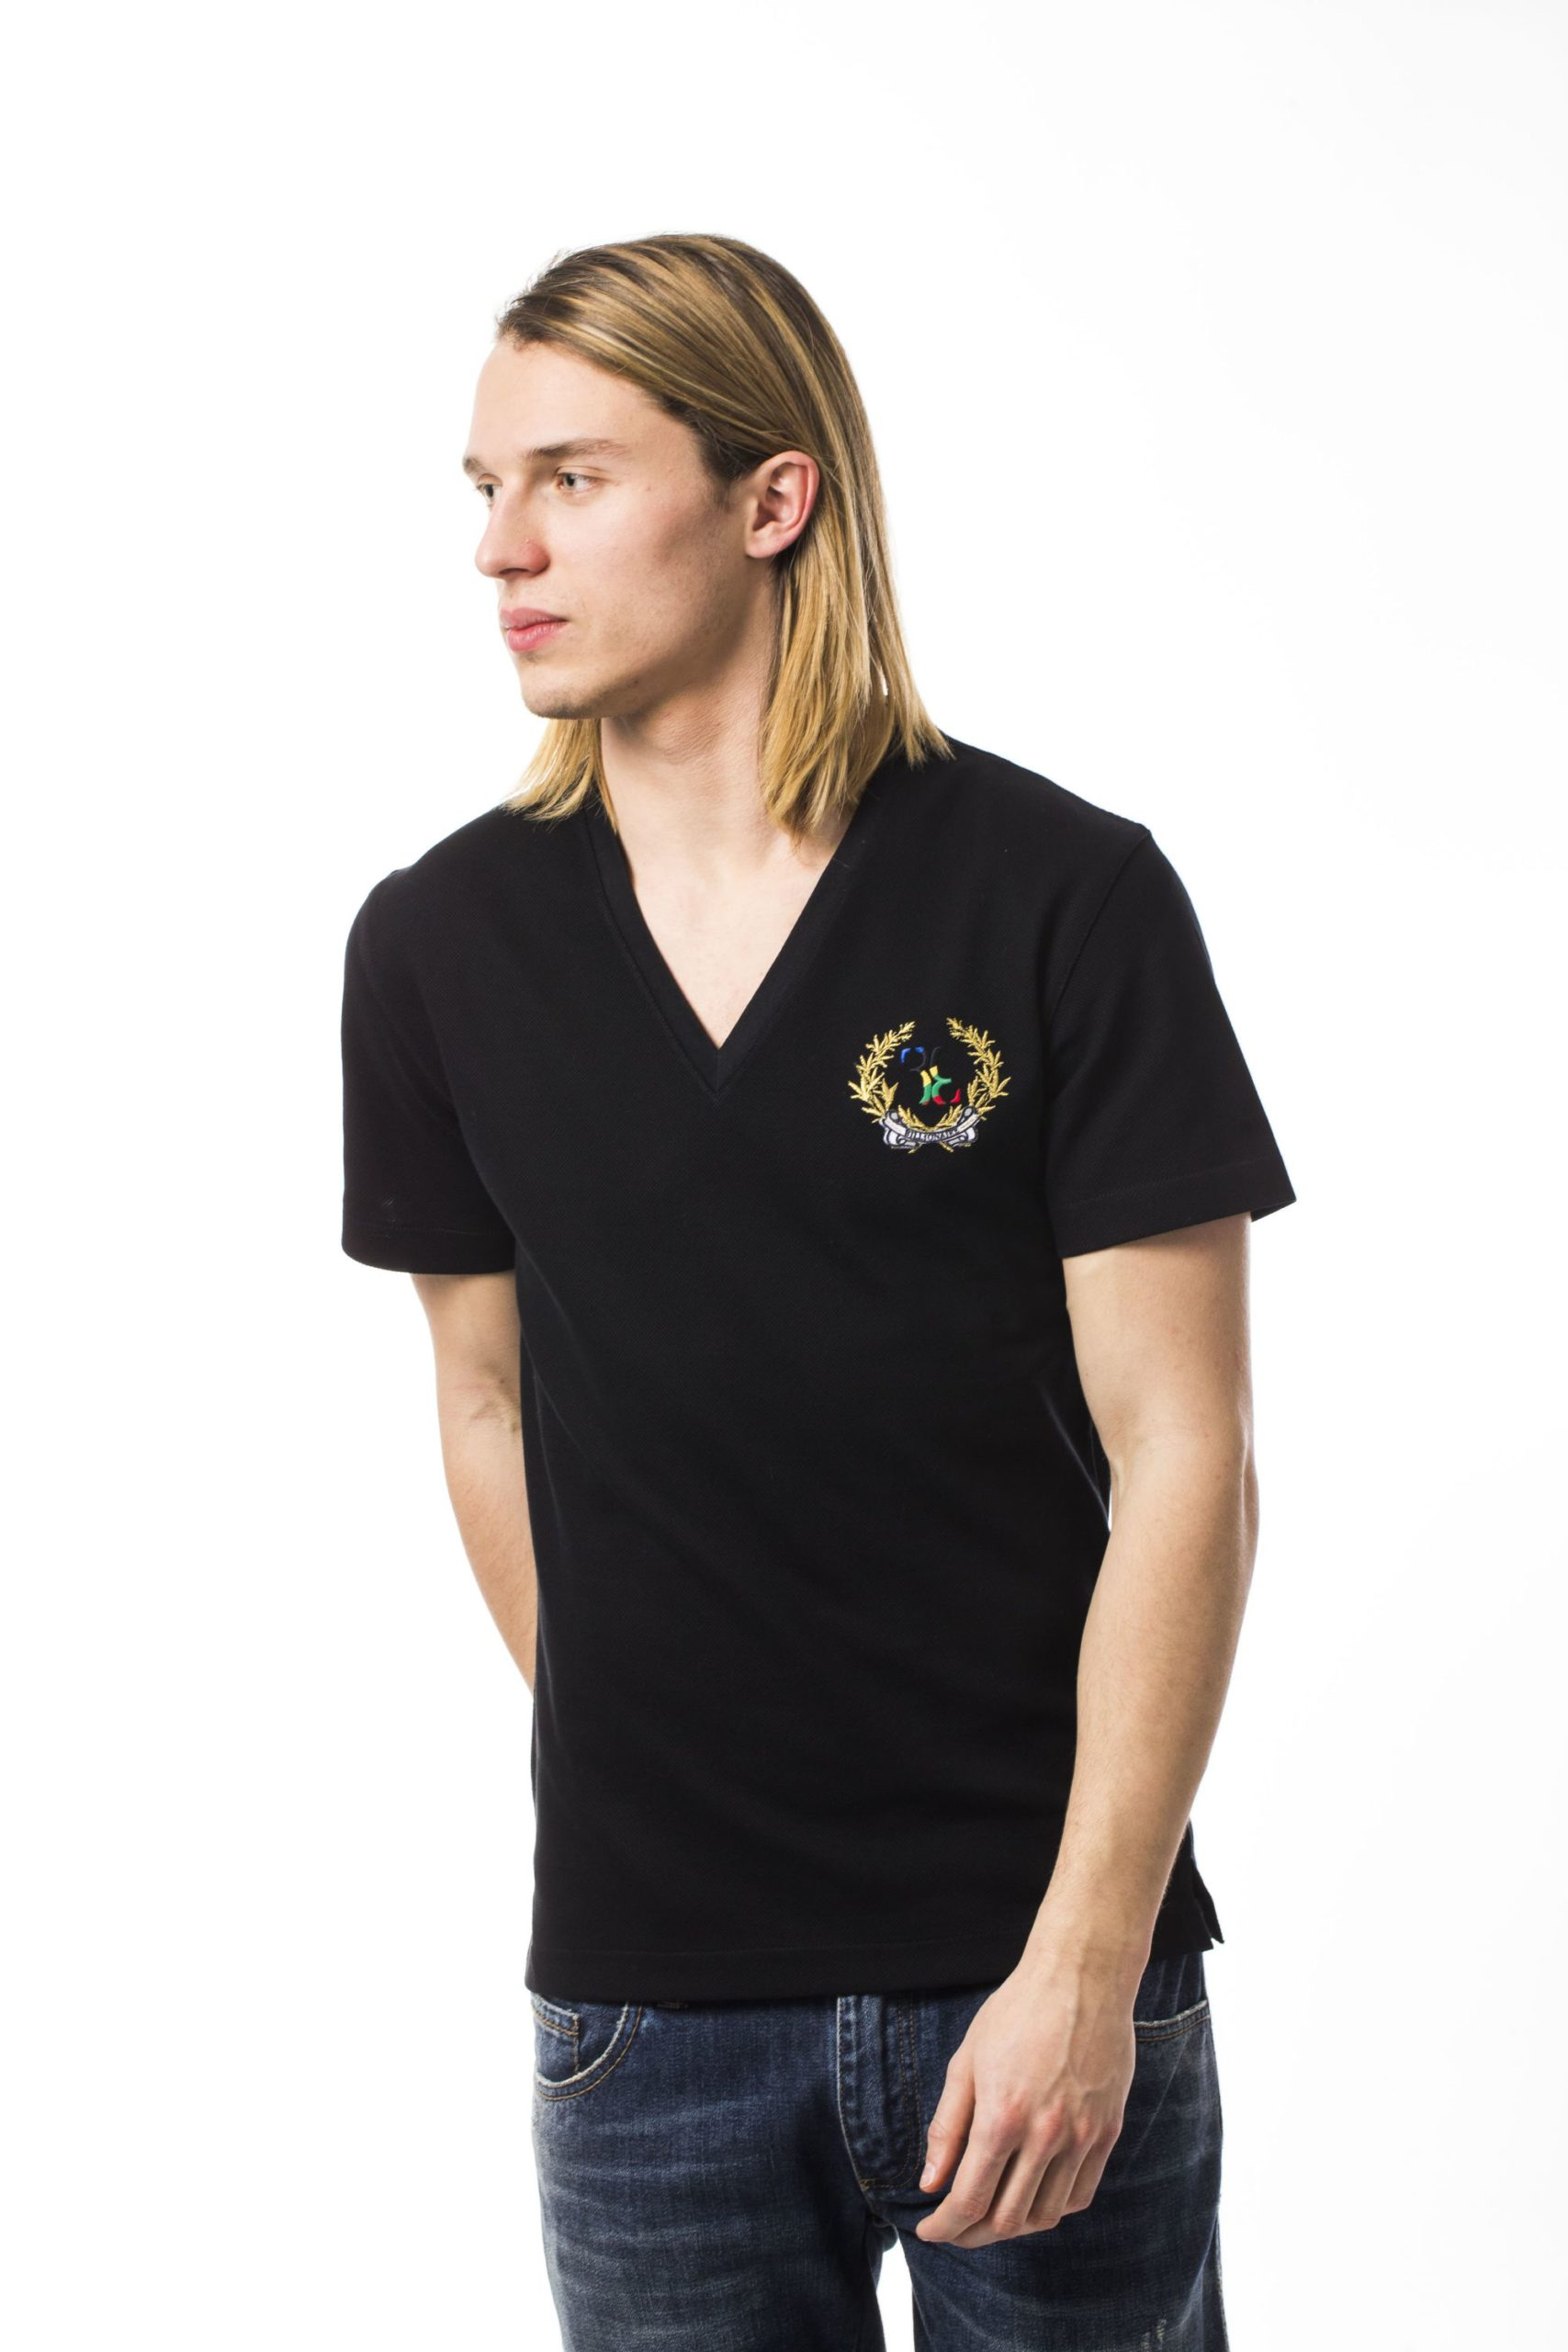 Billionaire Italian Couture Men's T-Shirt Black BI680663 - XXS